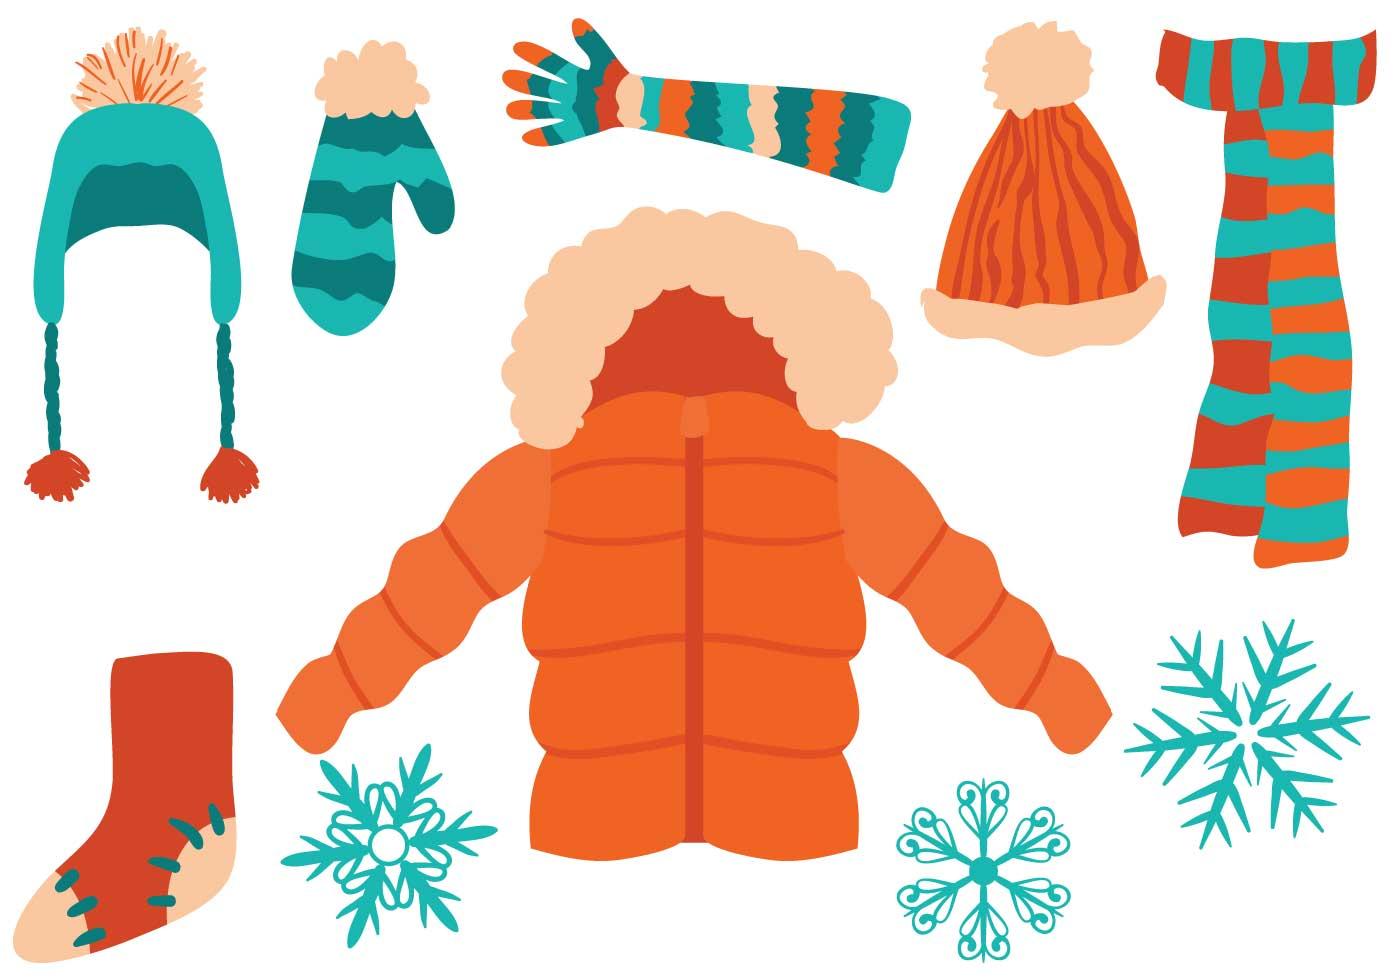 Free Winter Clothing Vectors - Download Free Vector Art ...